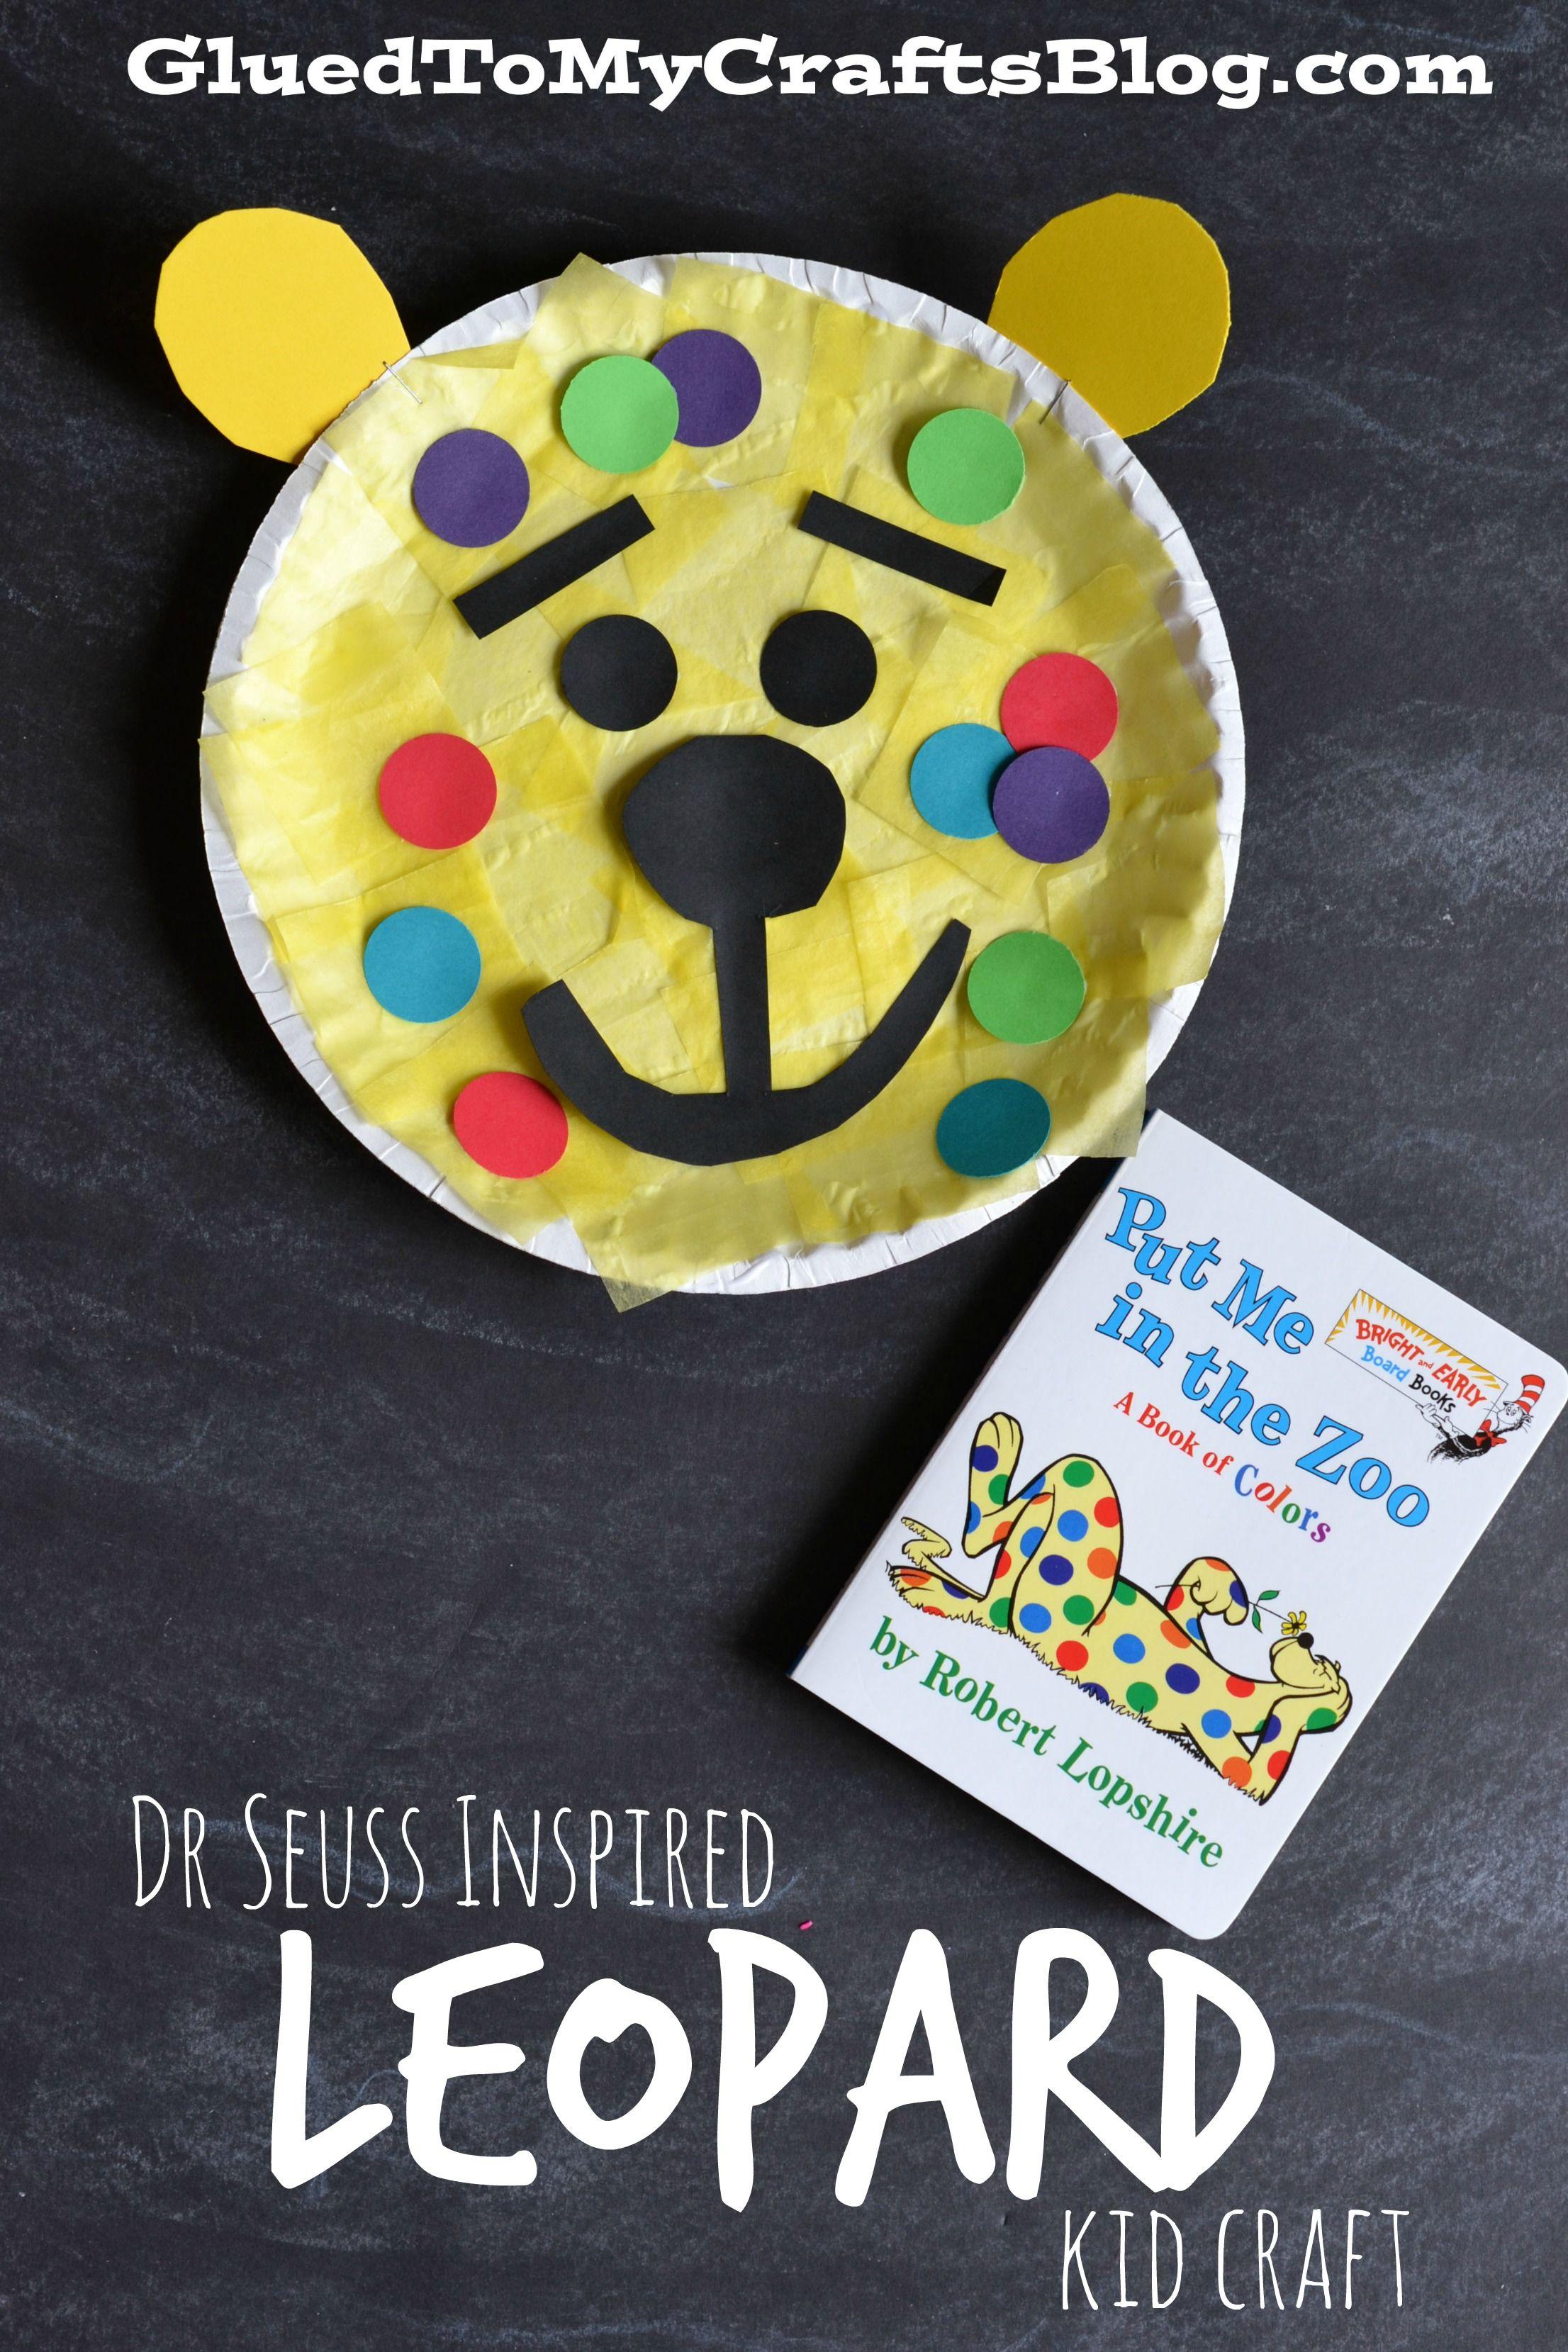 Dr Seuss Inspired Leopard Kid Craft